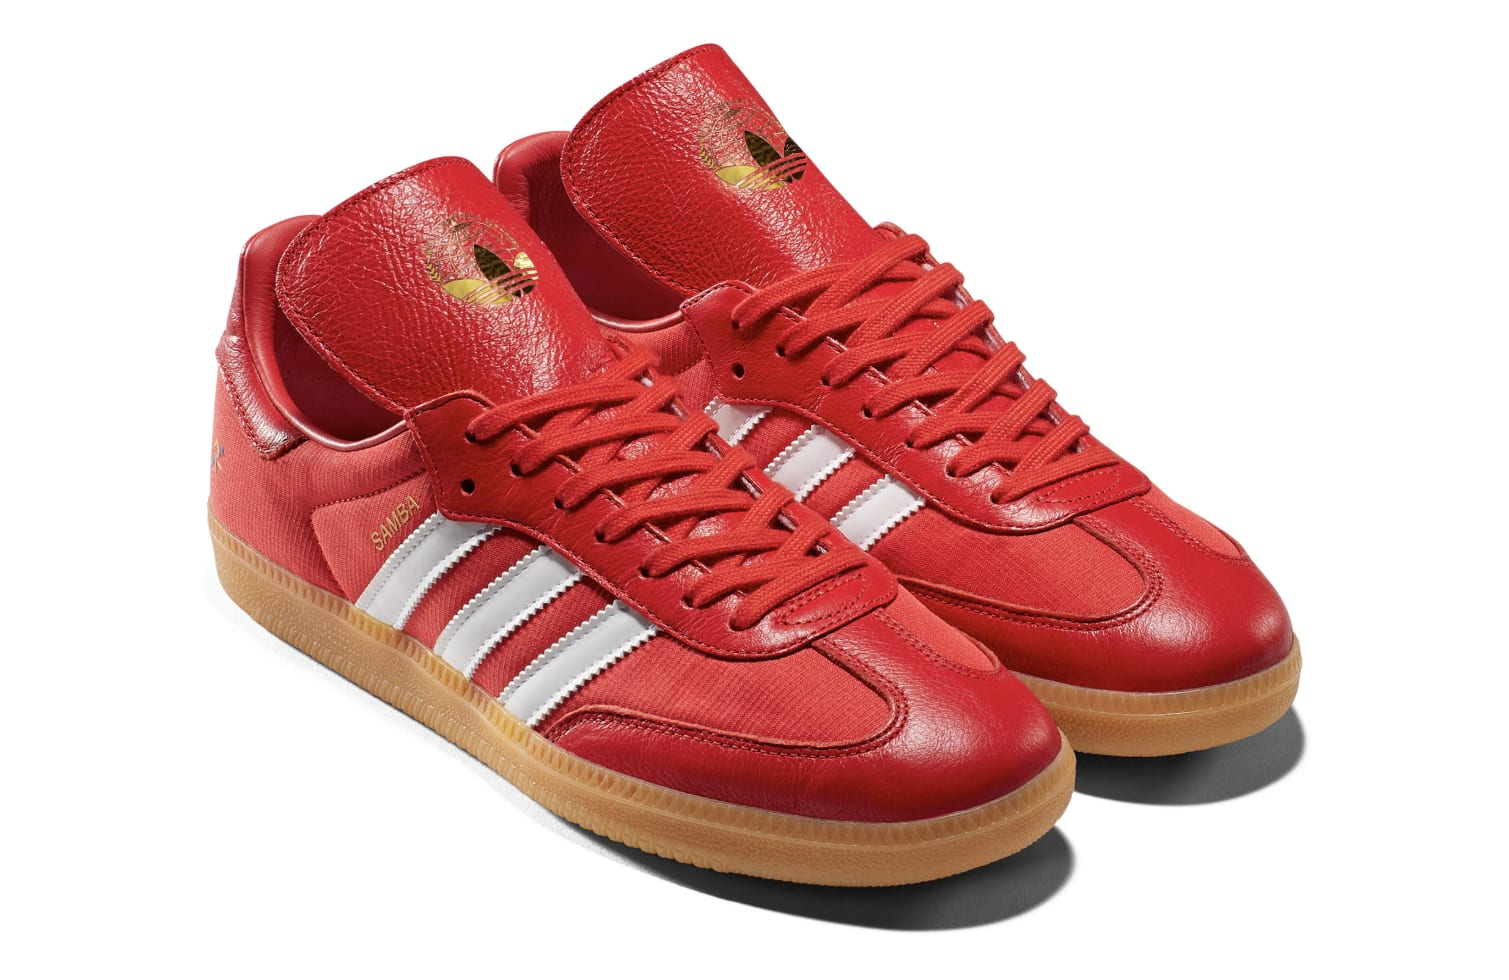 Oyster Holdings x Adidas Samba OG 'Red' G26700